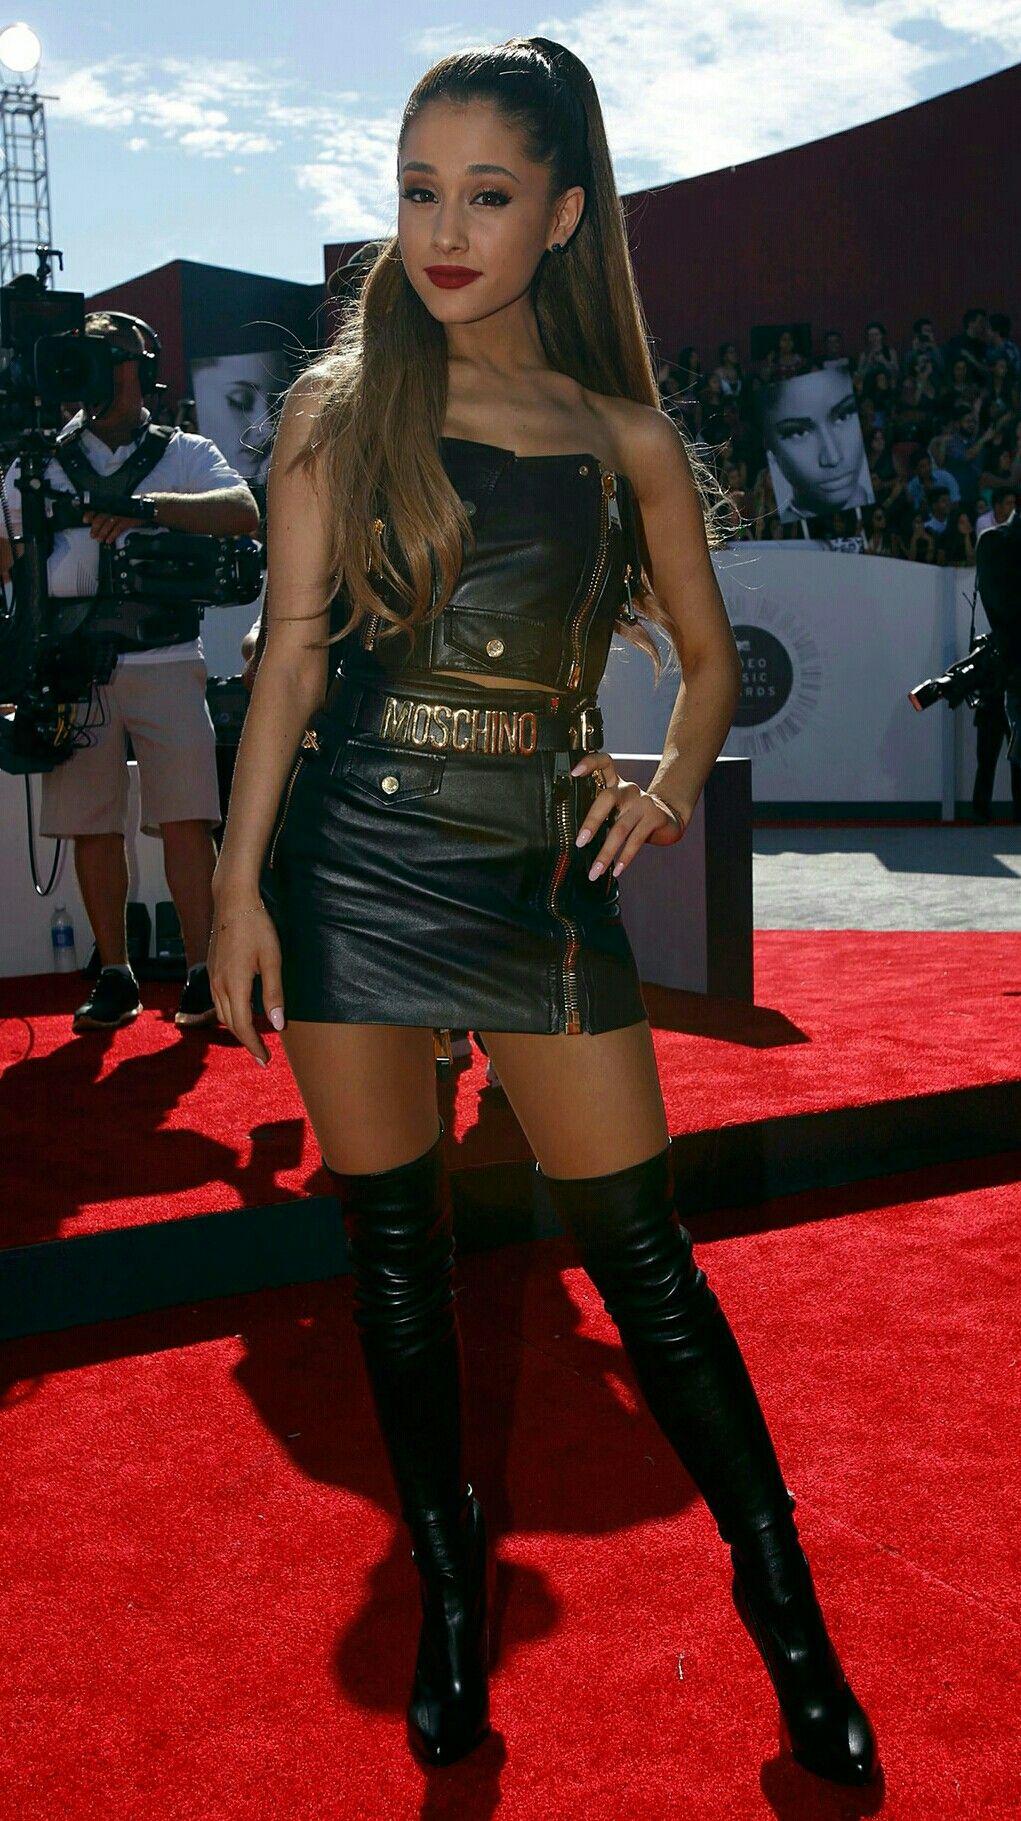 dcca3c8e350 Ariana Grande Moschino leather skirt thigh boots Slay🔥🔥